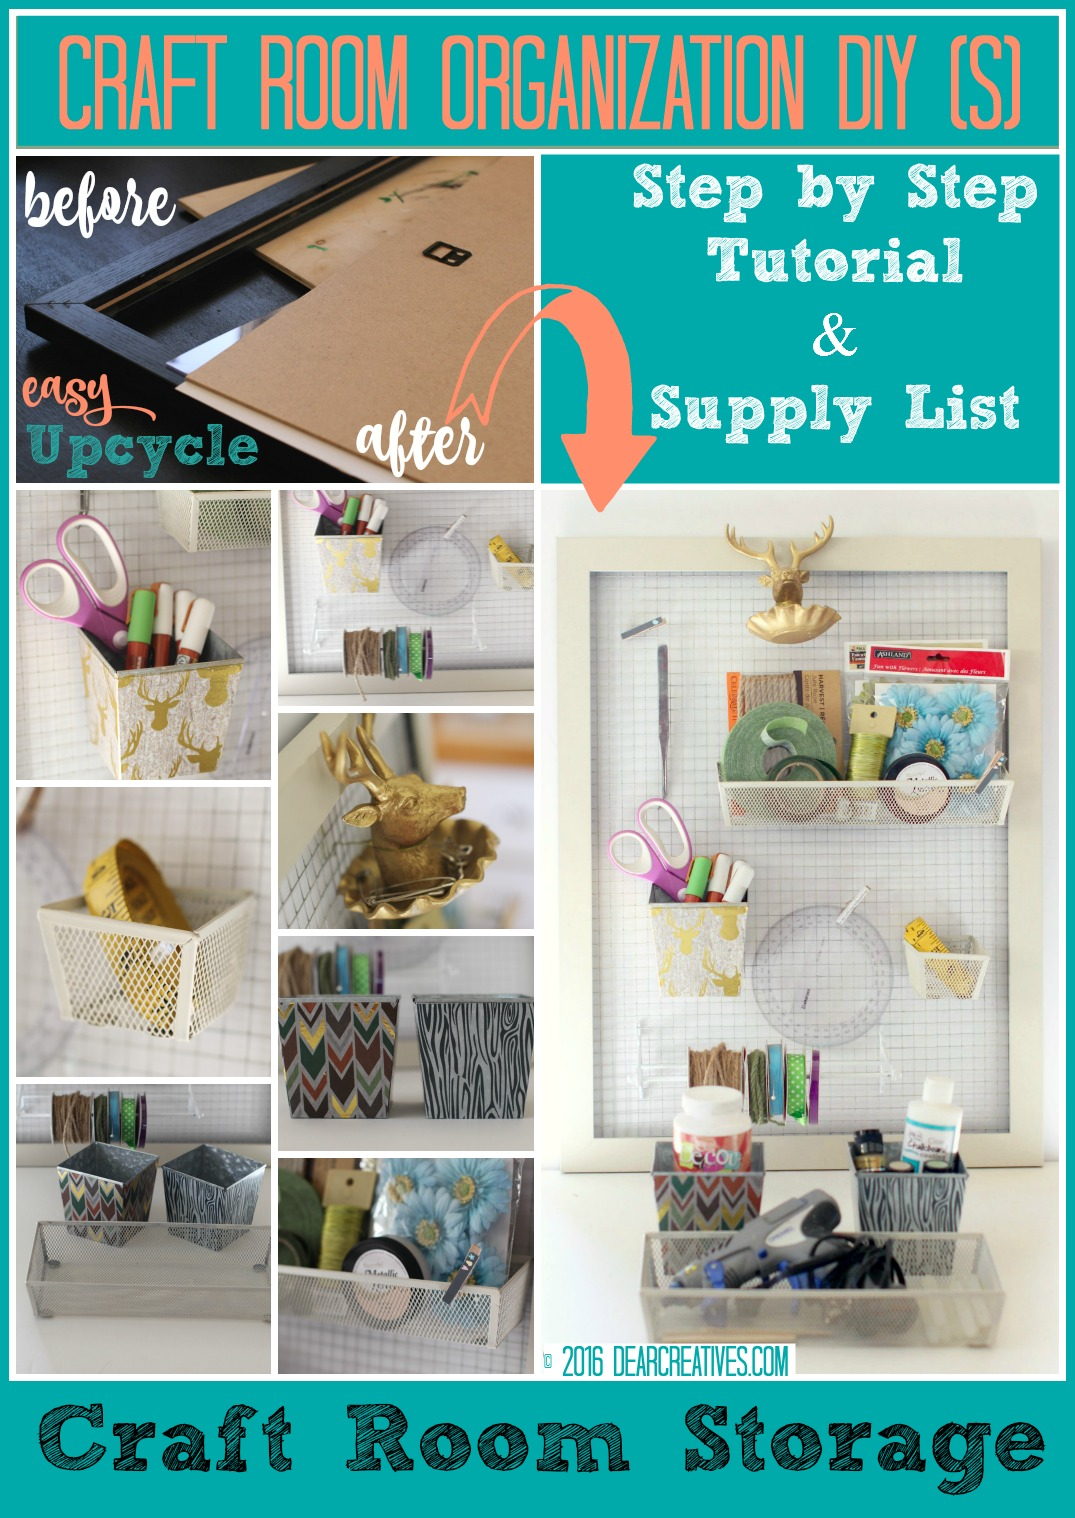 Craft Storage Wall Organizer See How To Make This Organizer